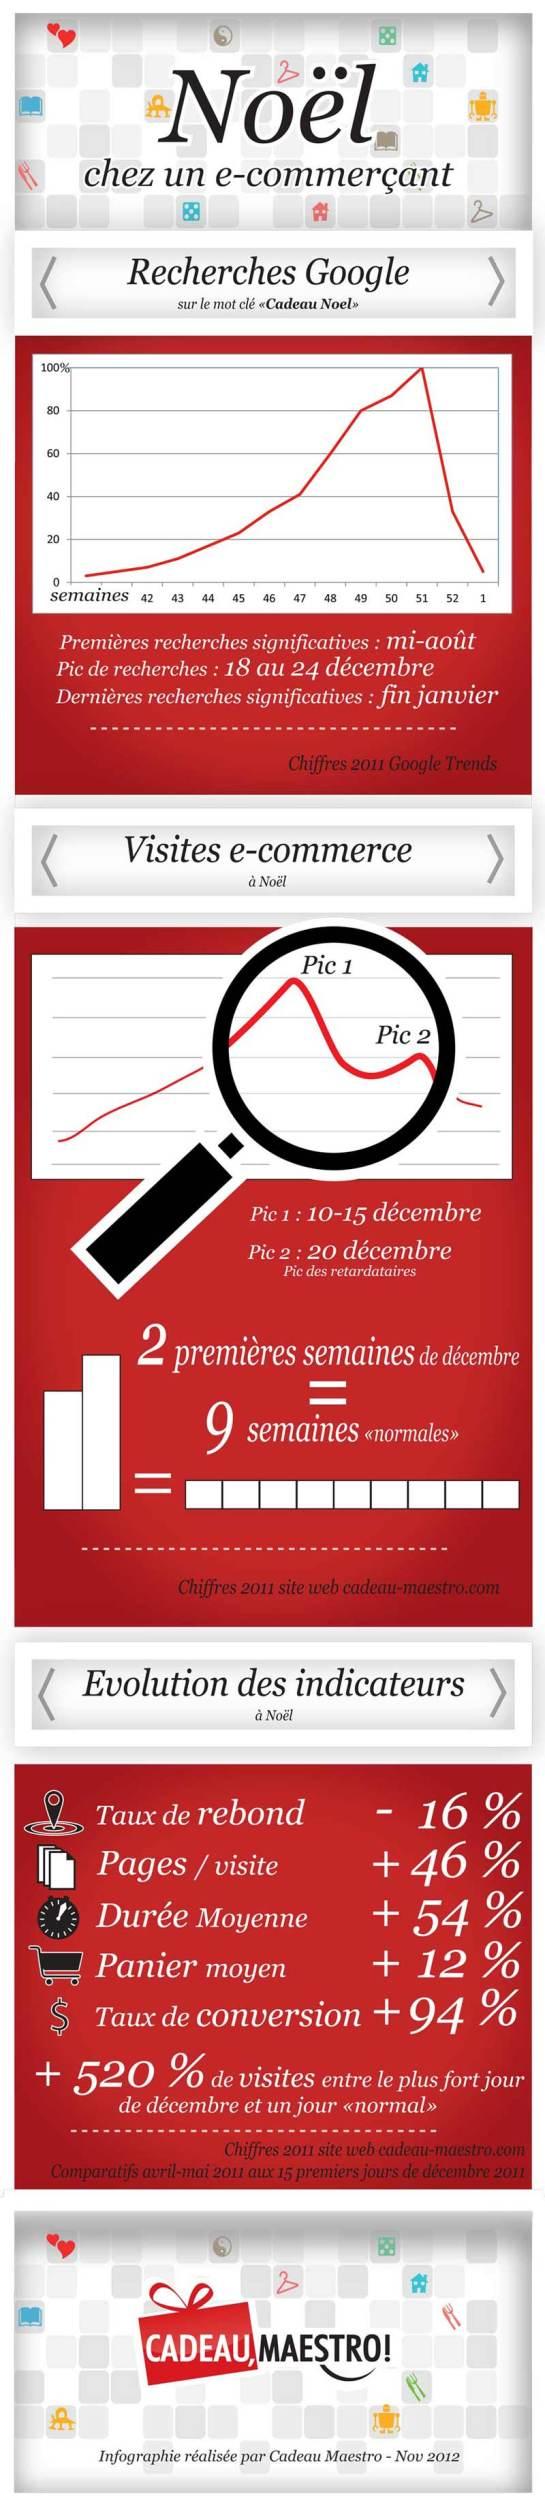 Infographie - Webmarketing Noël - Statistiques